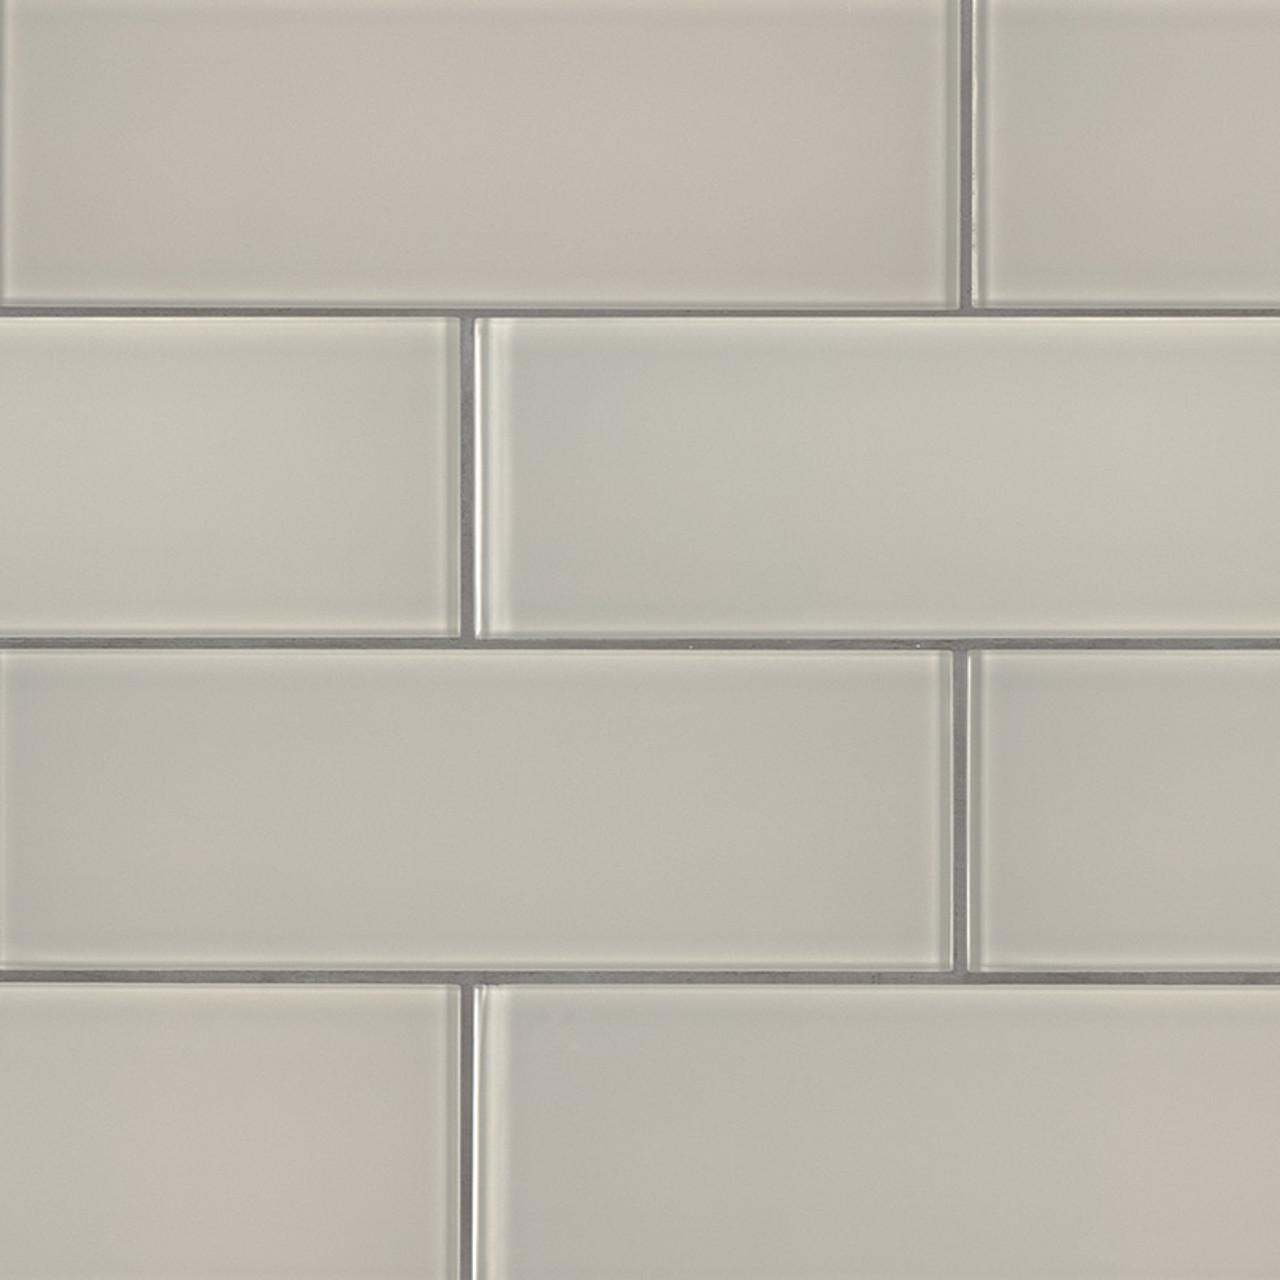 - Snowcap White Subway Tile 3x9 - Tiles Direct Store